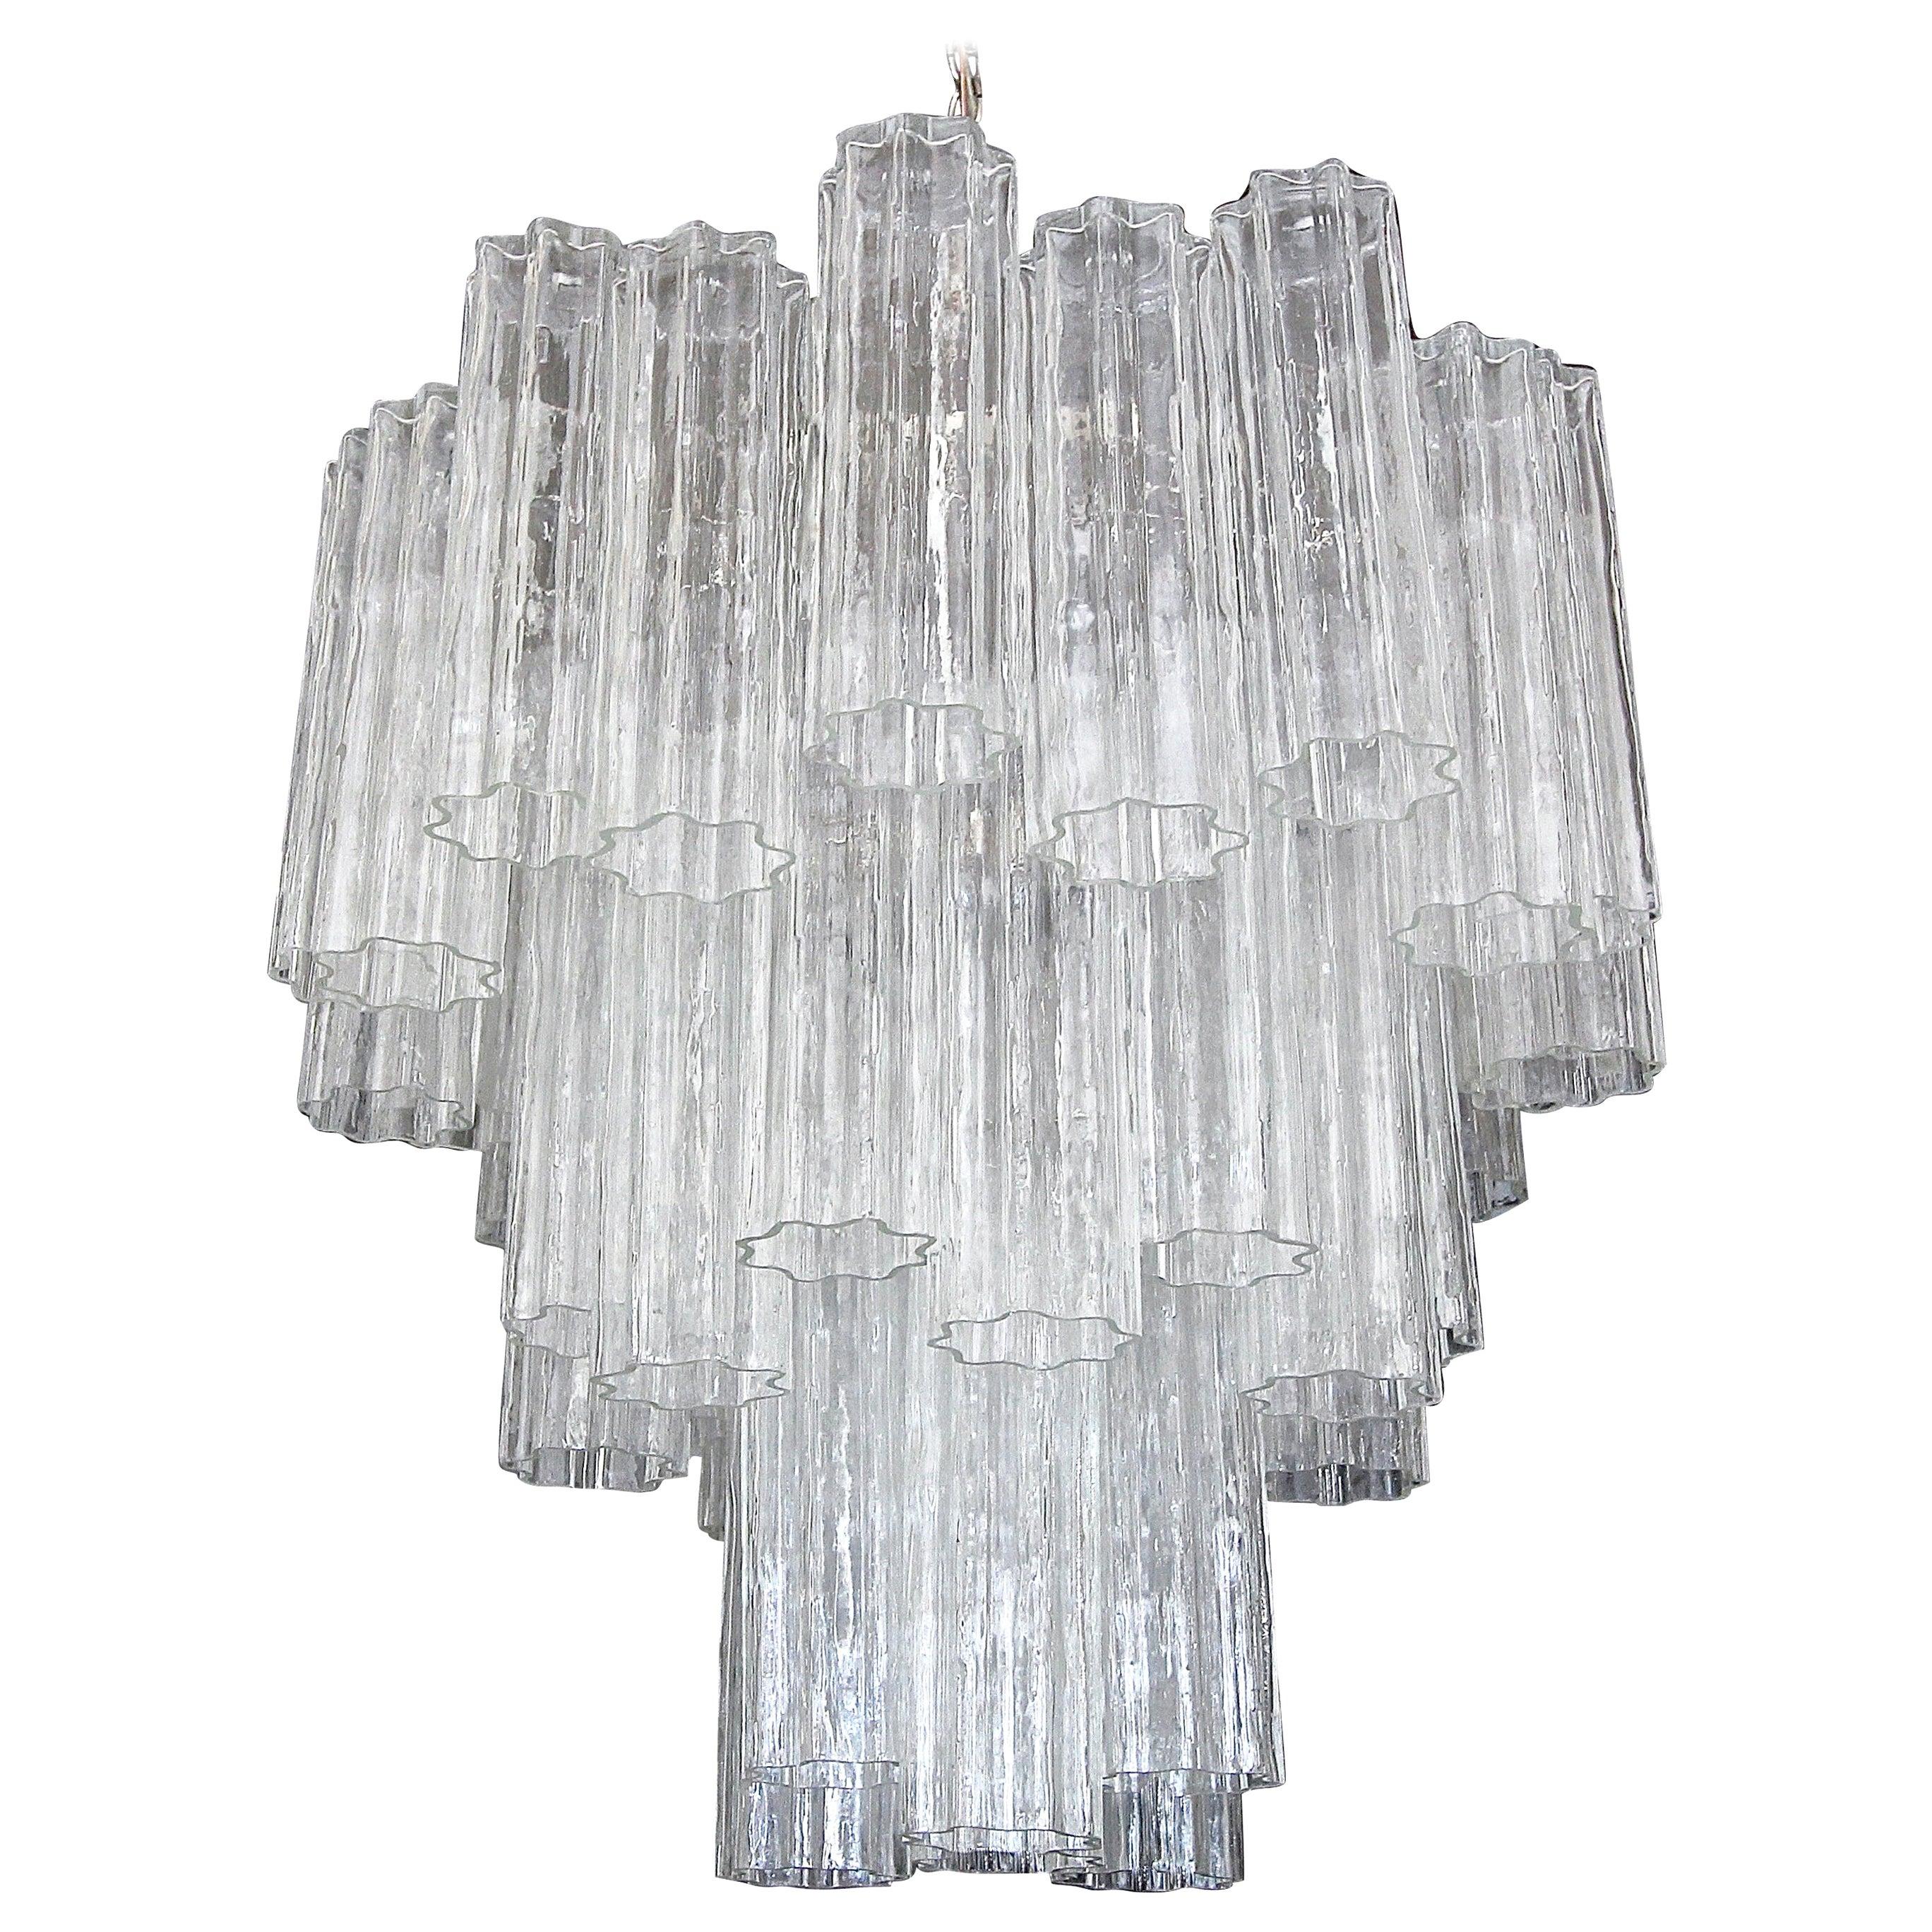 Large Venini Murano Tronchi Glass Tube Chandelier